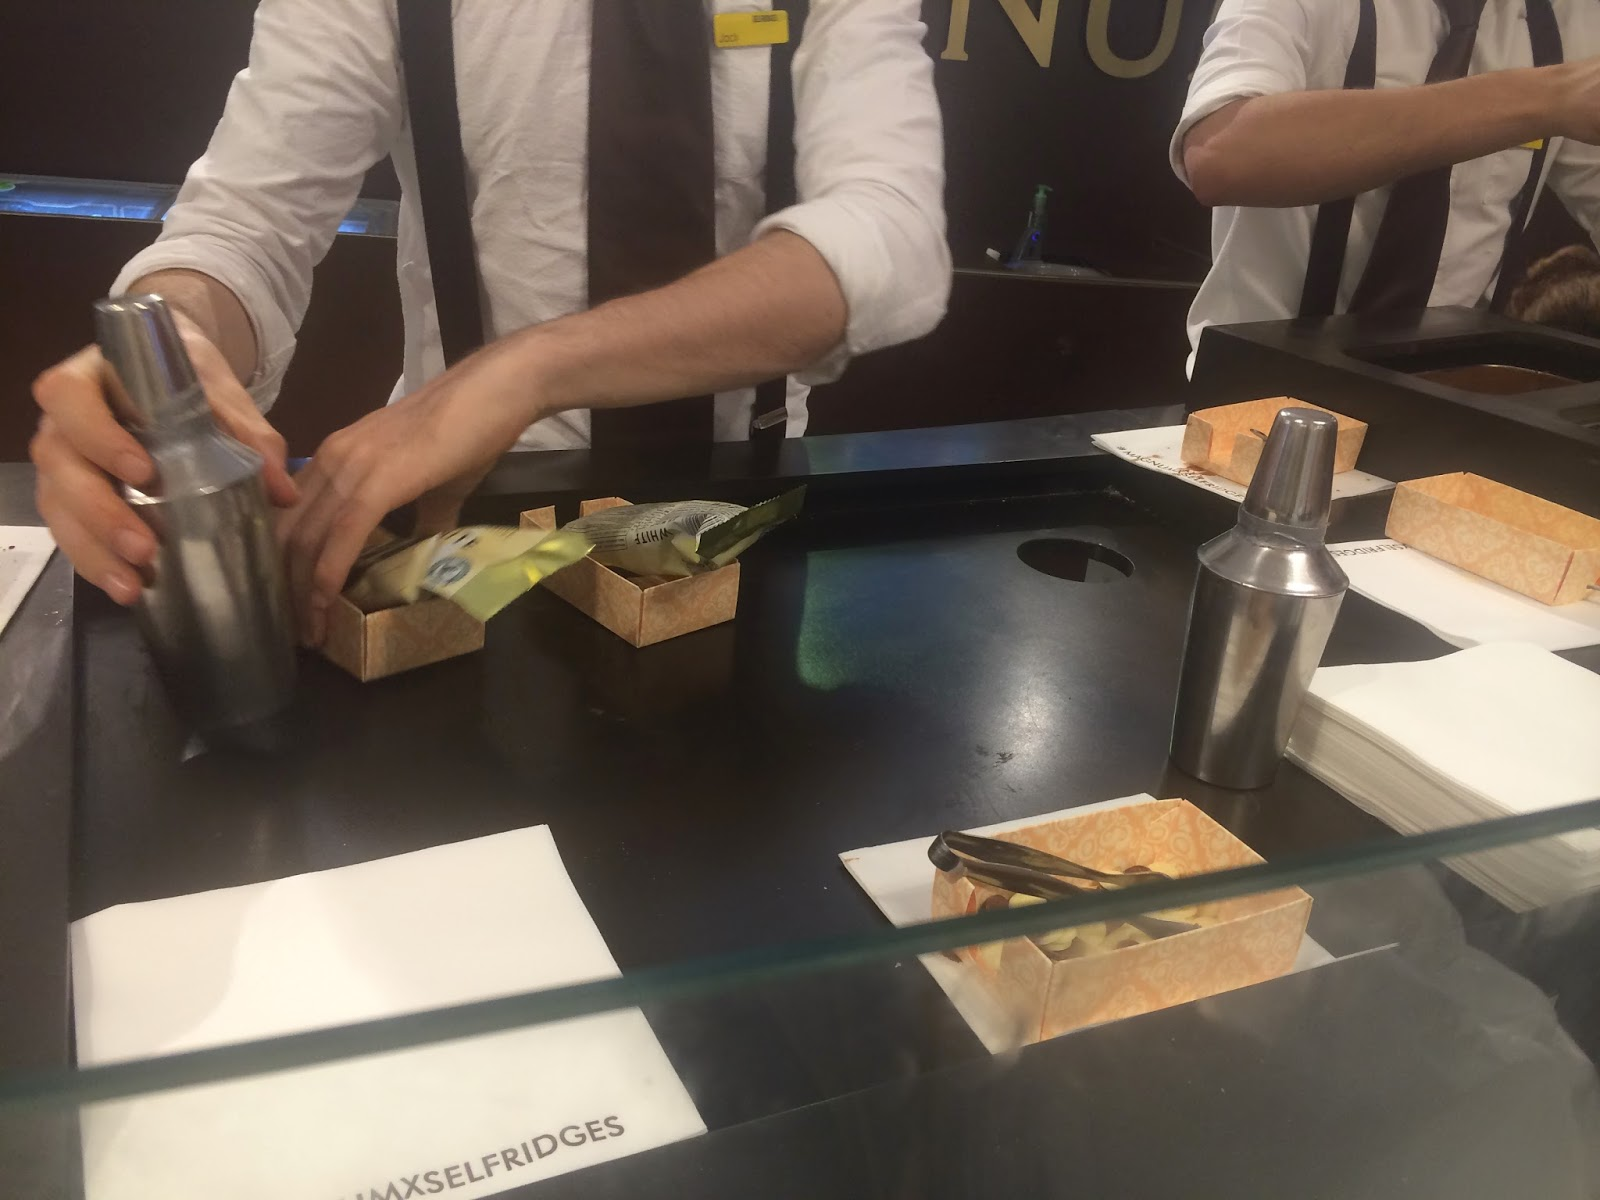 Make Your Own Magnum at Selfridges #Magnumxselfridges